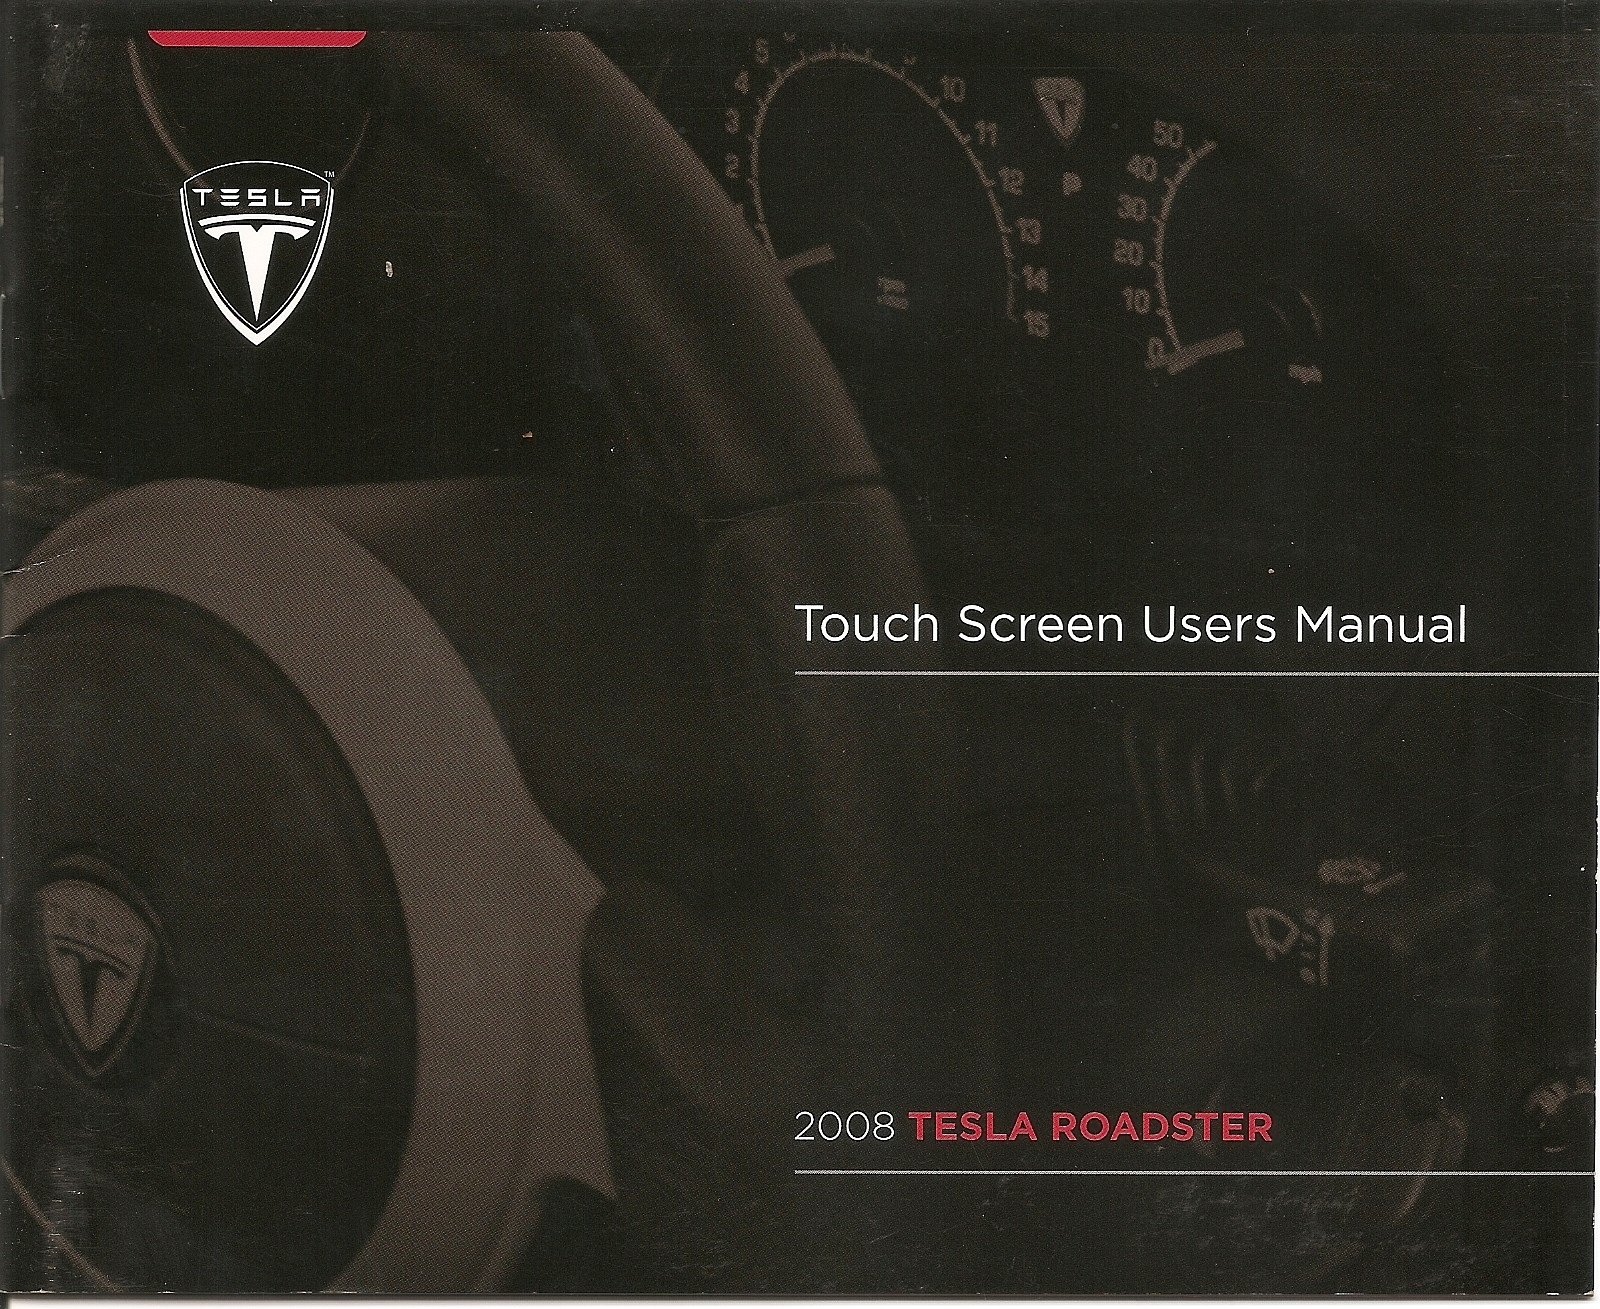 TouchScreen Users Manual.JPG